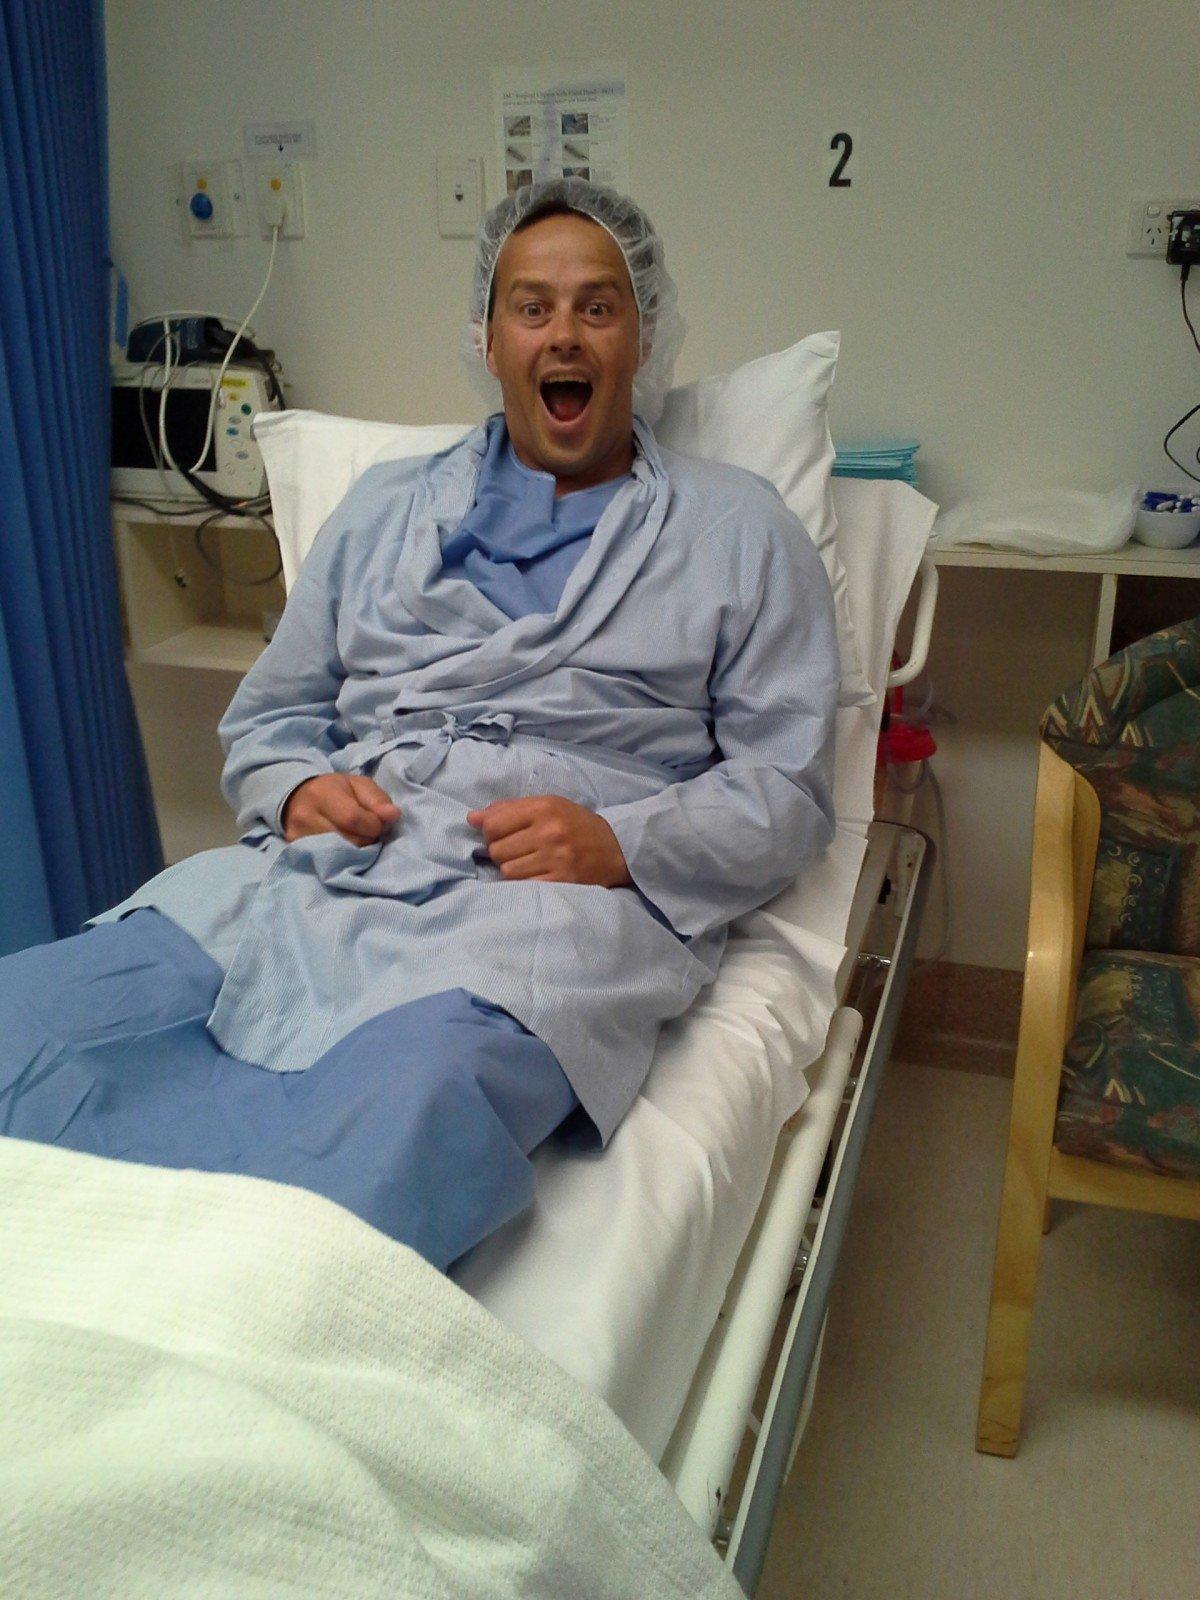 Hombre en cama de hospital. | Imagen: PxHere